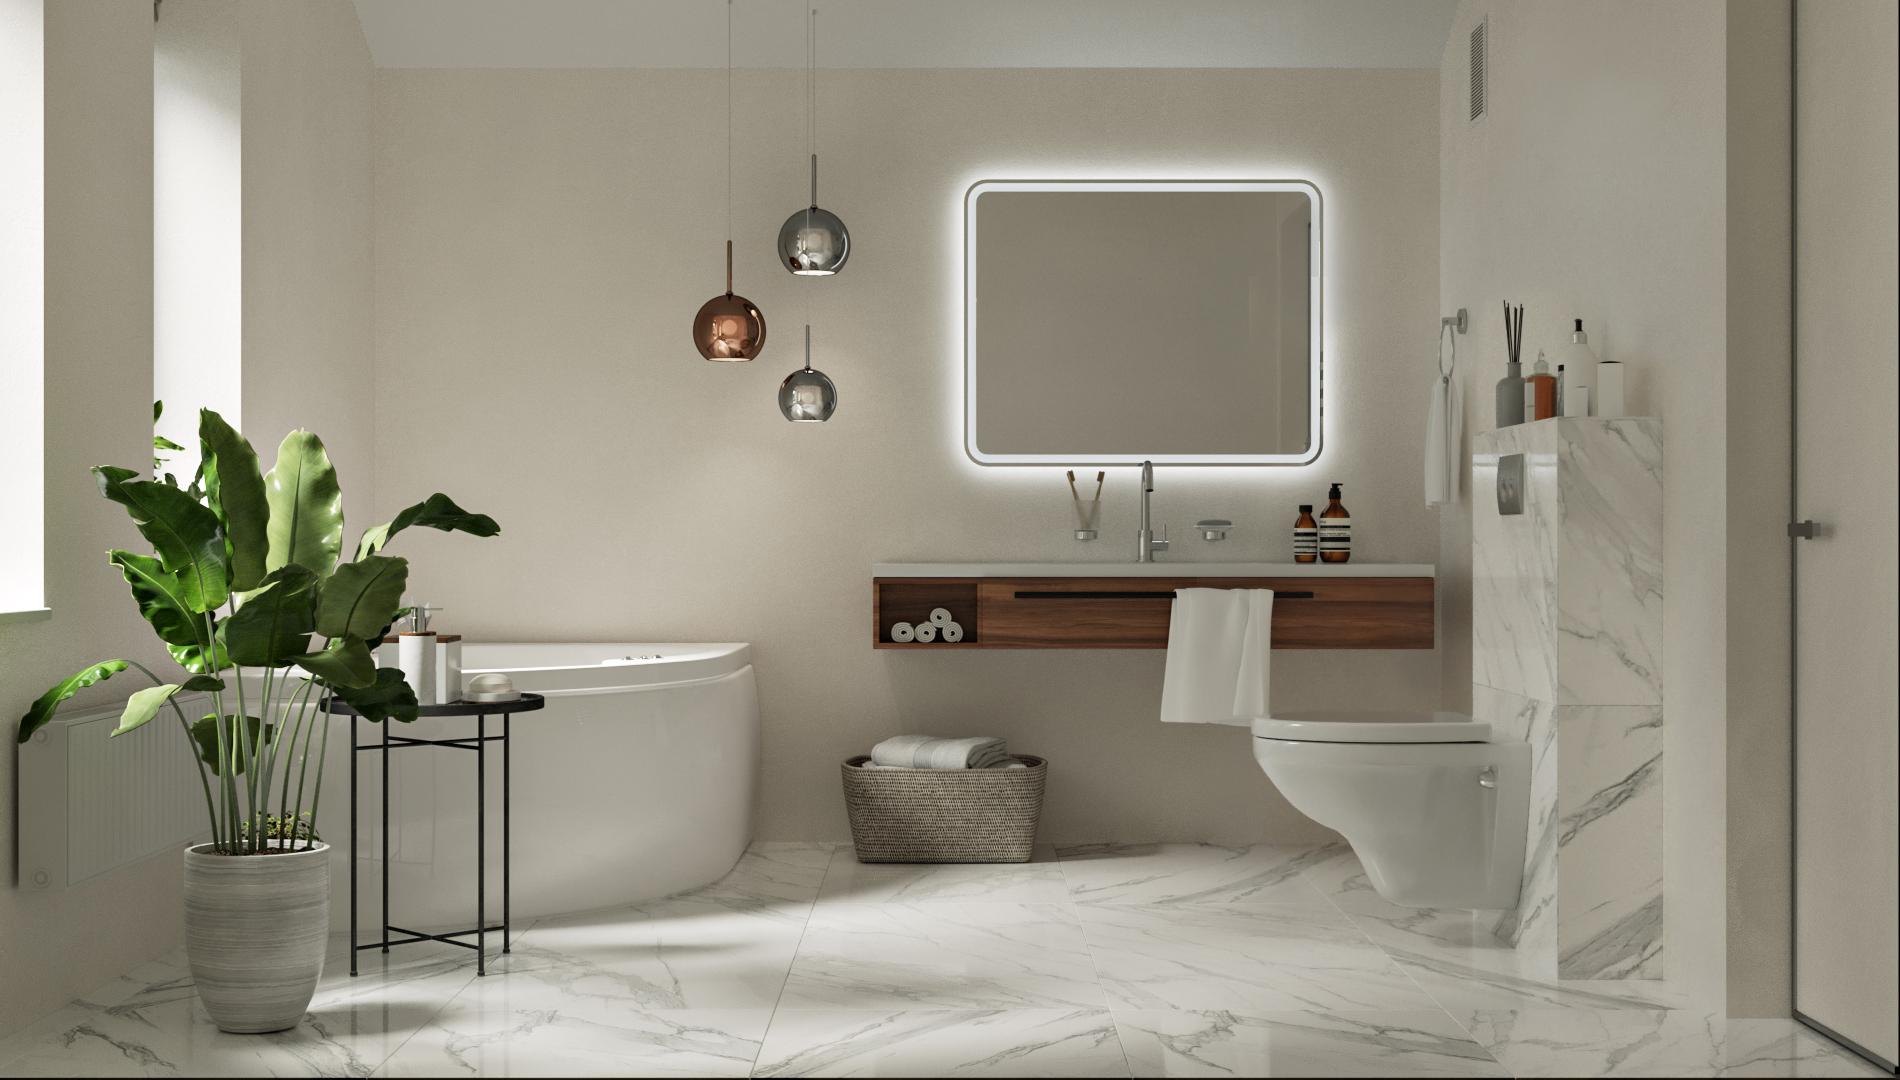 master-bathroom_et_vladimirskaya_obl_15.06.2020_02_010_04_01_01